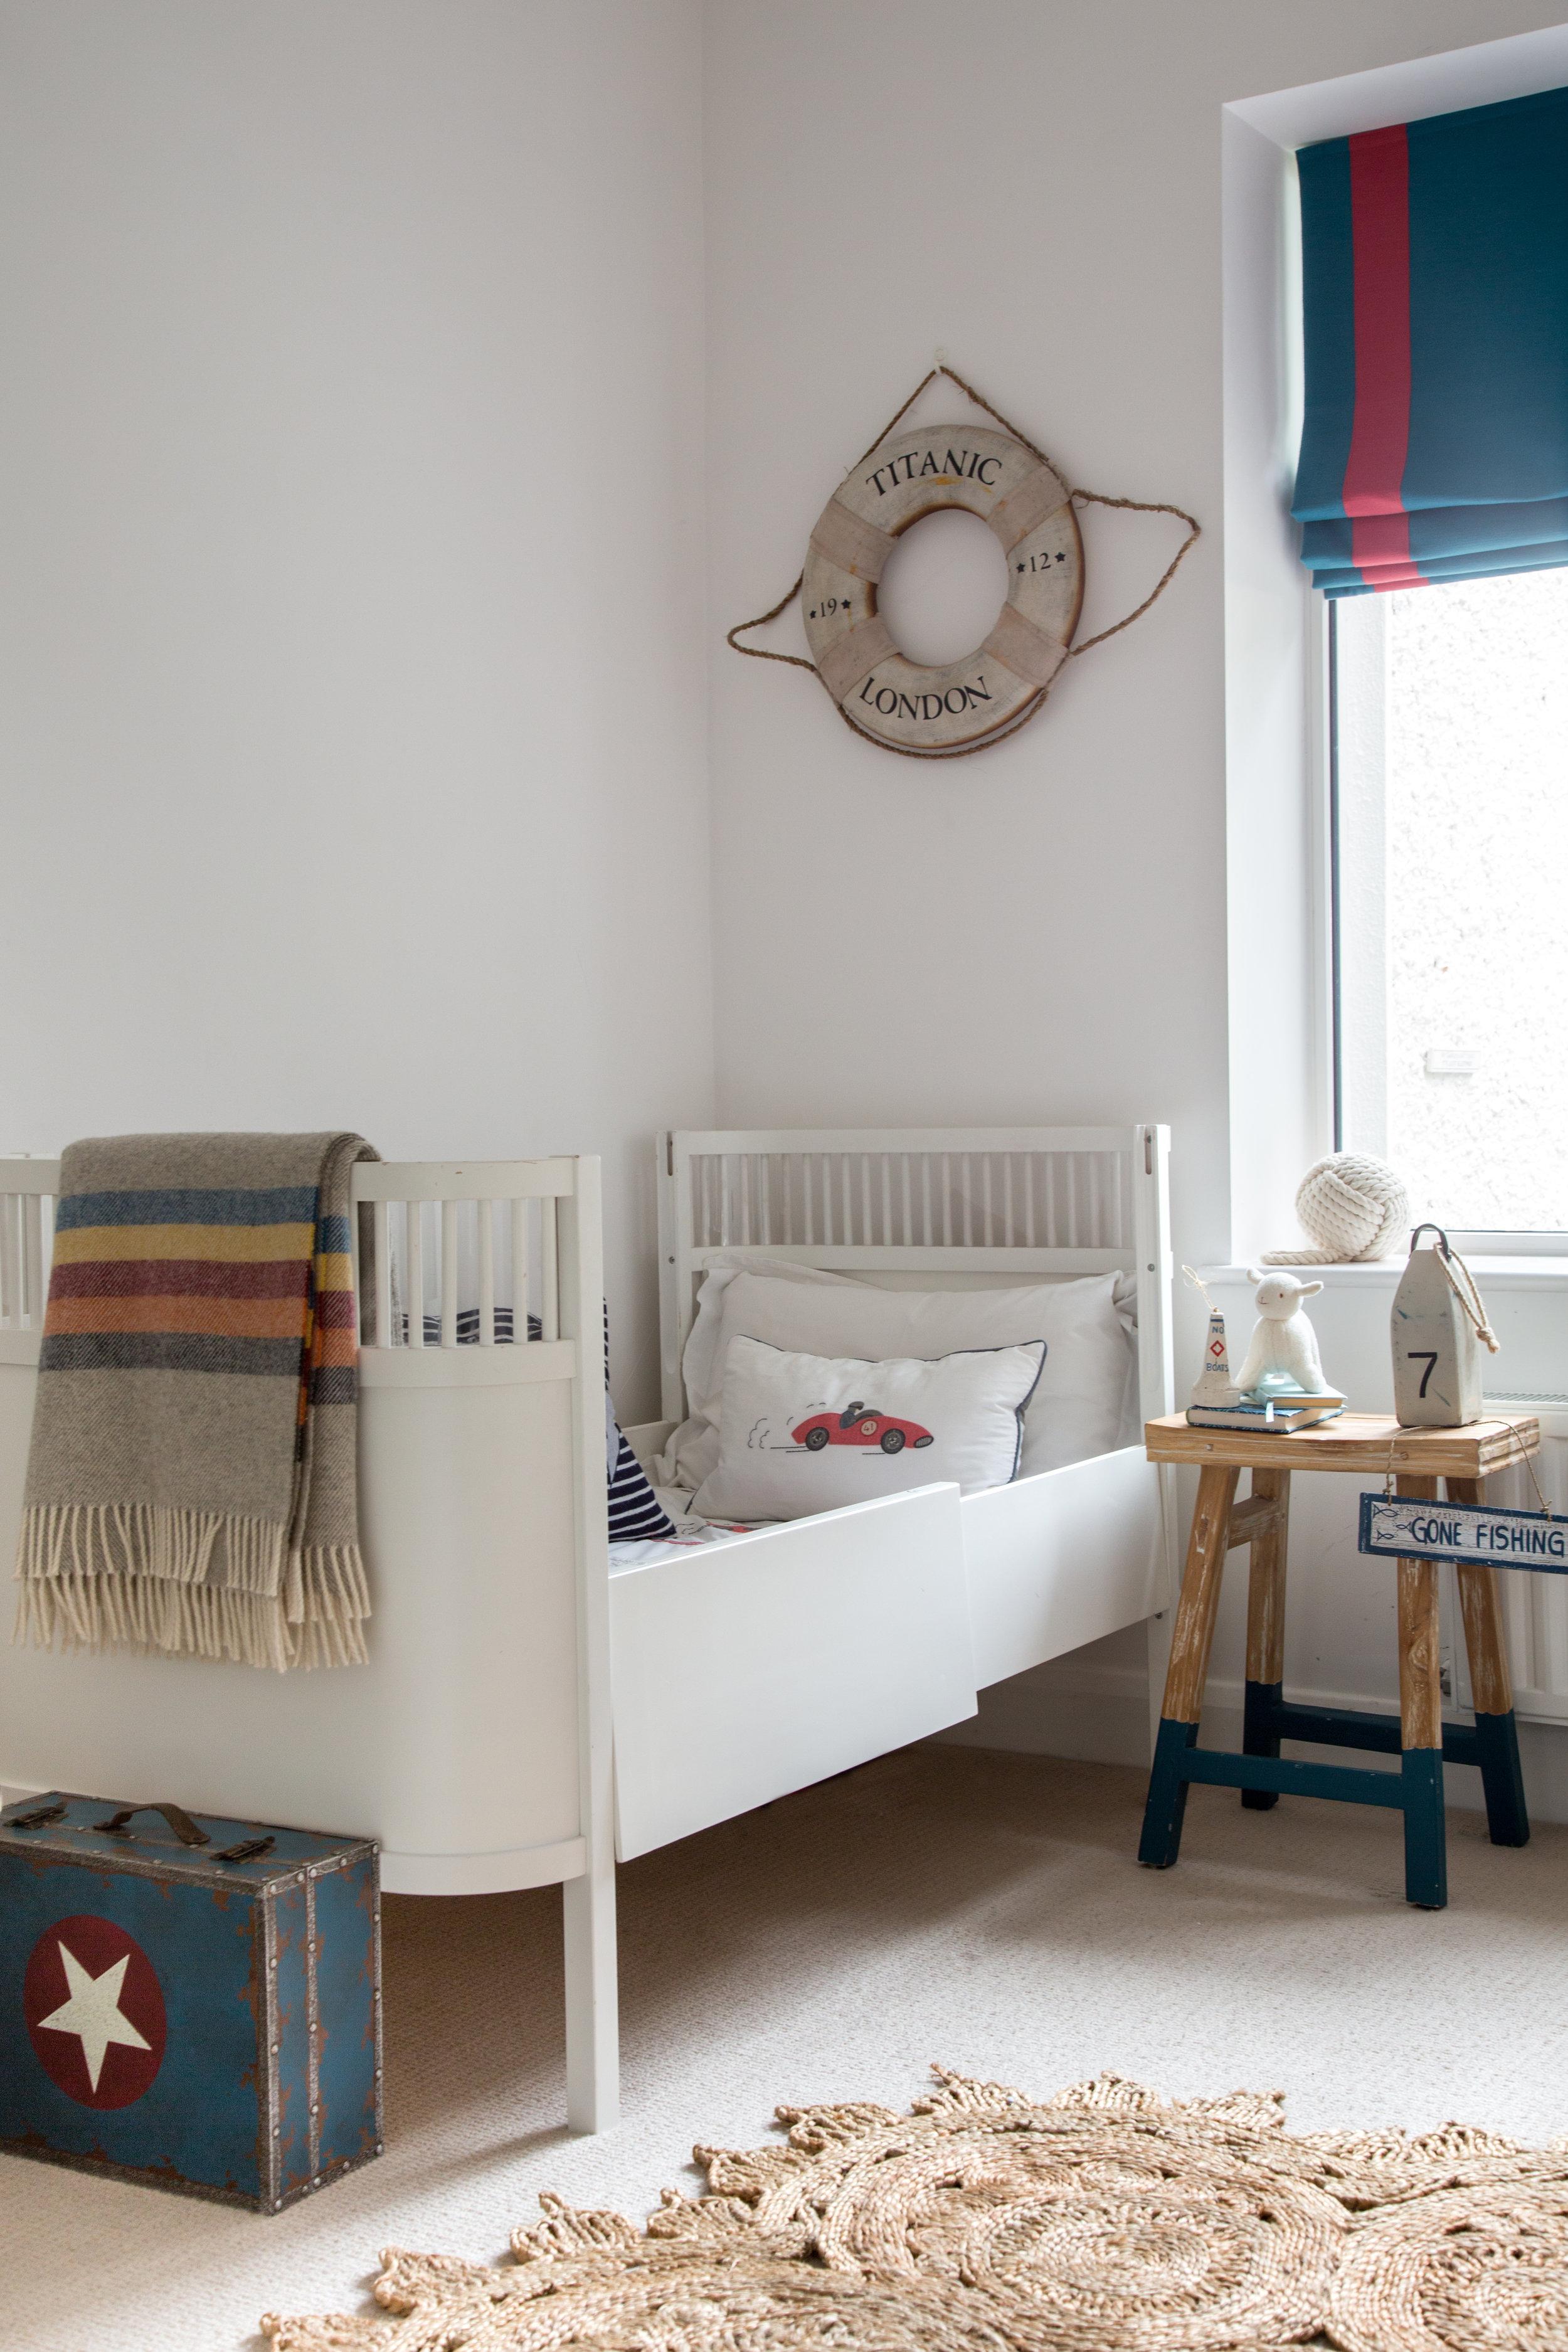 Lamb_Design_Paper_and_Moon_Emma_Lynch_Louise_Dockery_Scandi_French_Danish_homeware_Irish_business_interior_designer_boys_bedroom_jute_rug.jpg